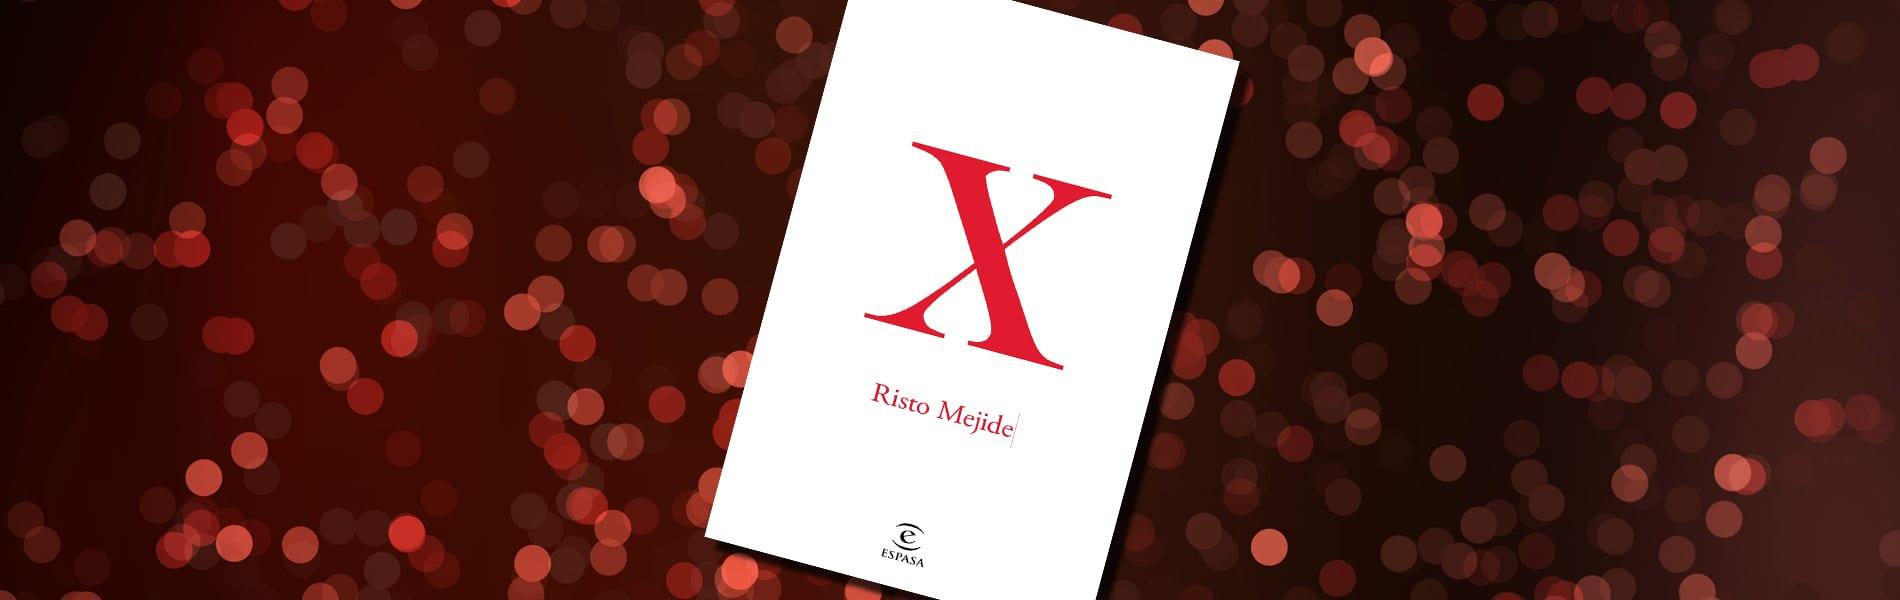 Amarna Miller Entrevista Risto Mejide x, de risto mejide - reseña